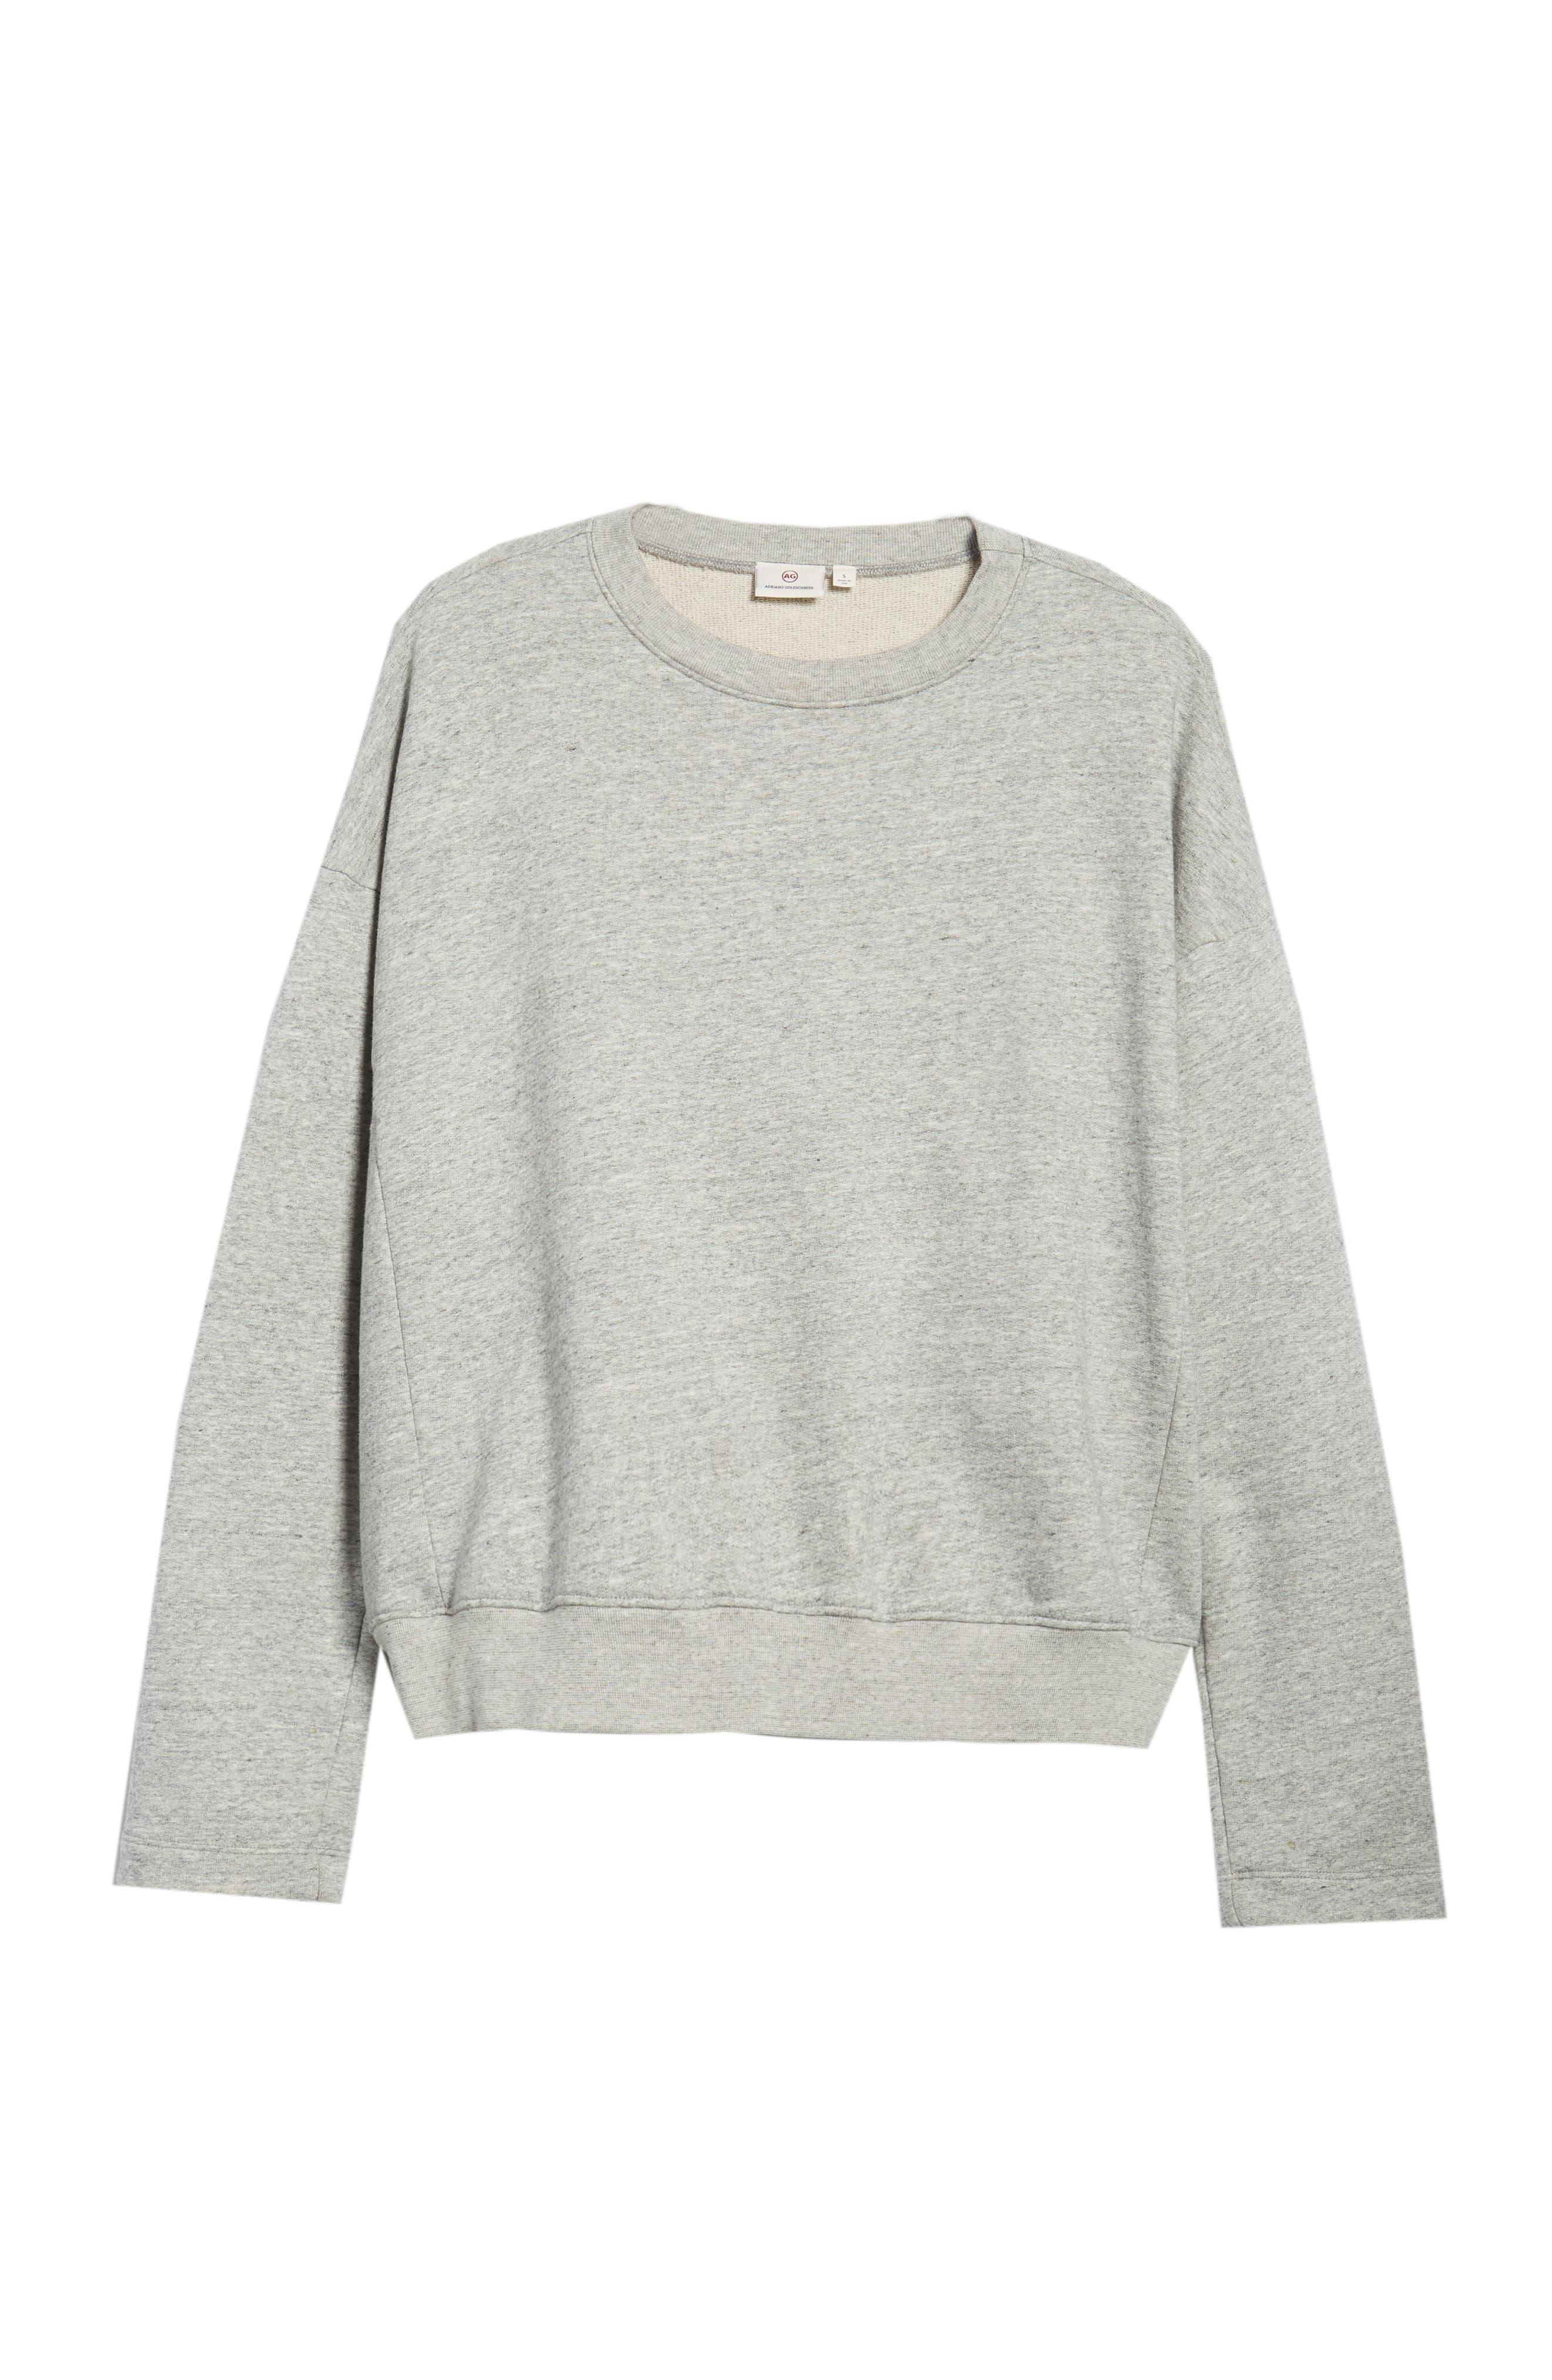 Berdine Oversize Sweatshirt,                             Alternate thumbnail 7, color,                             HEATHER GREY